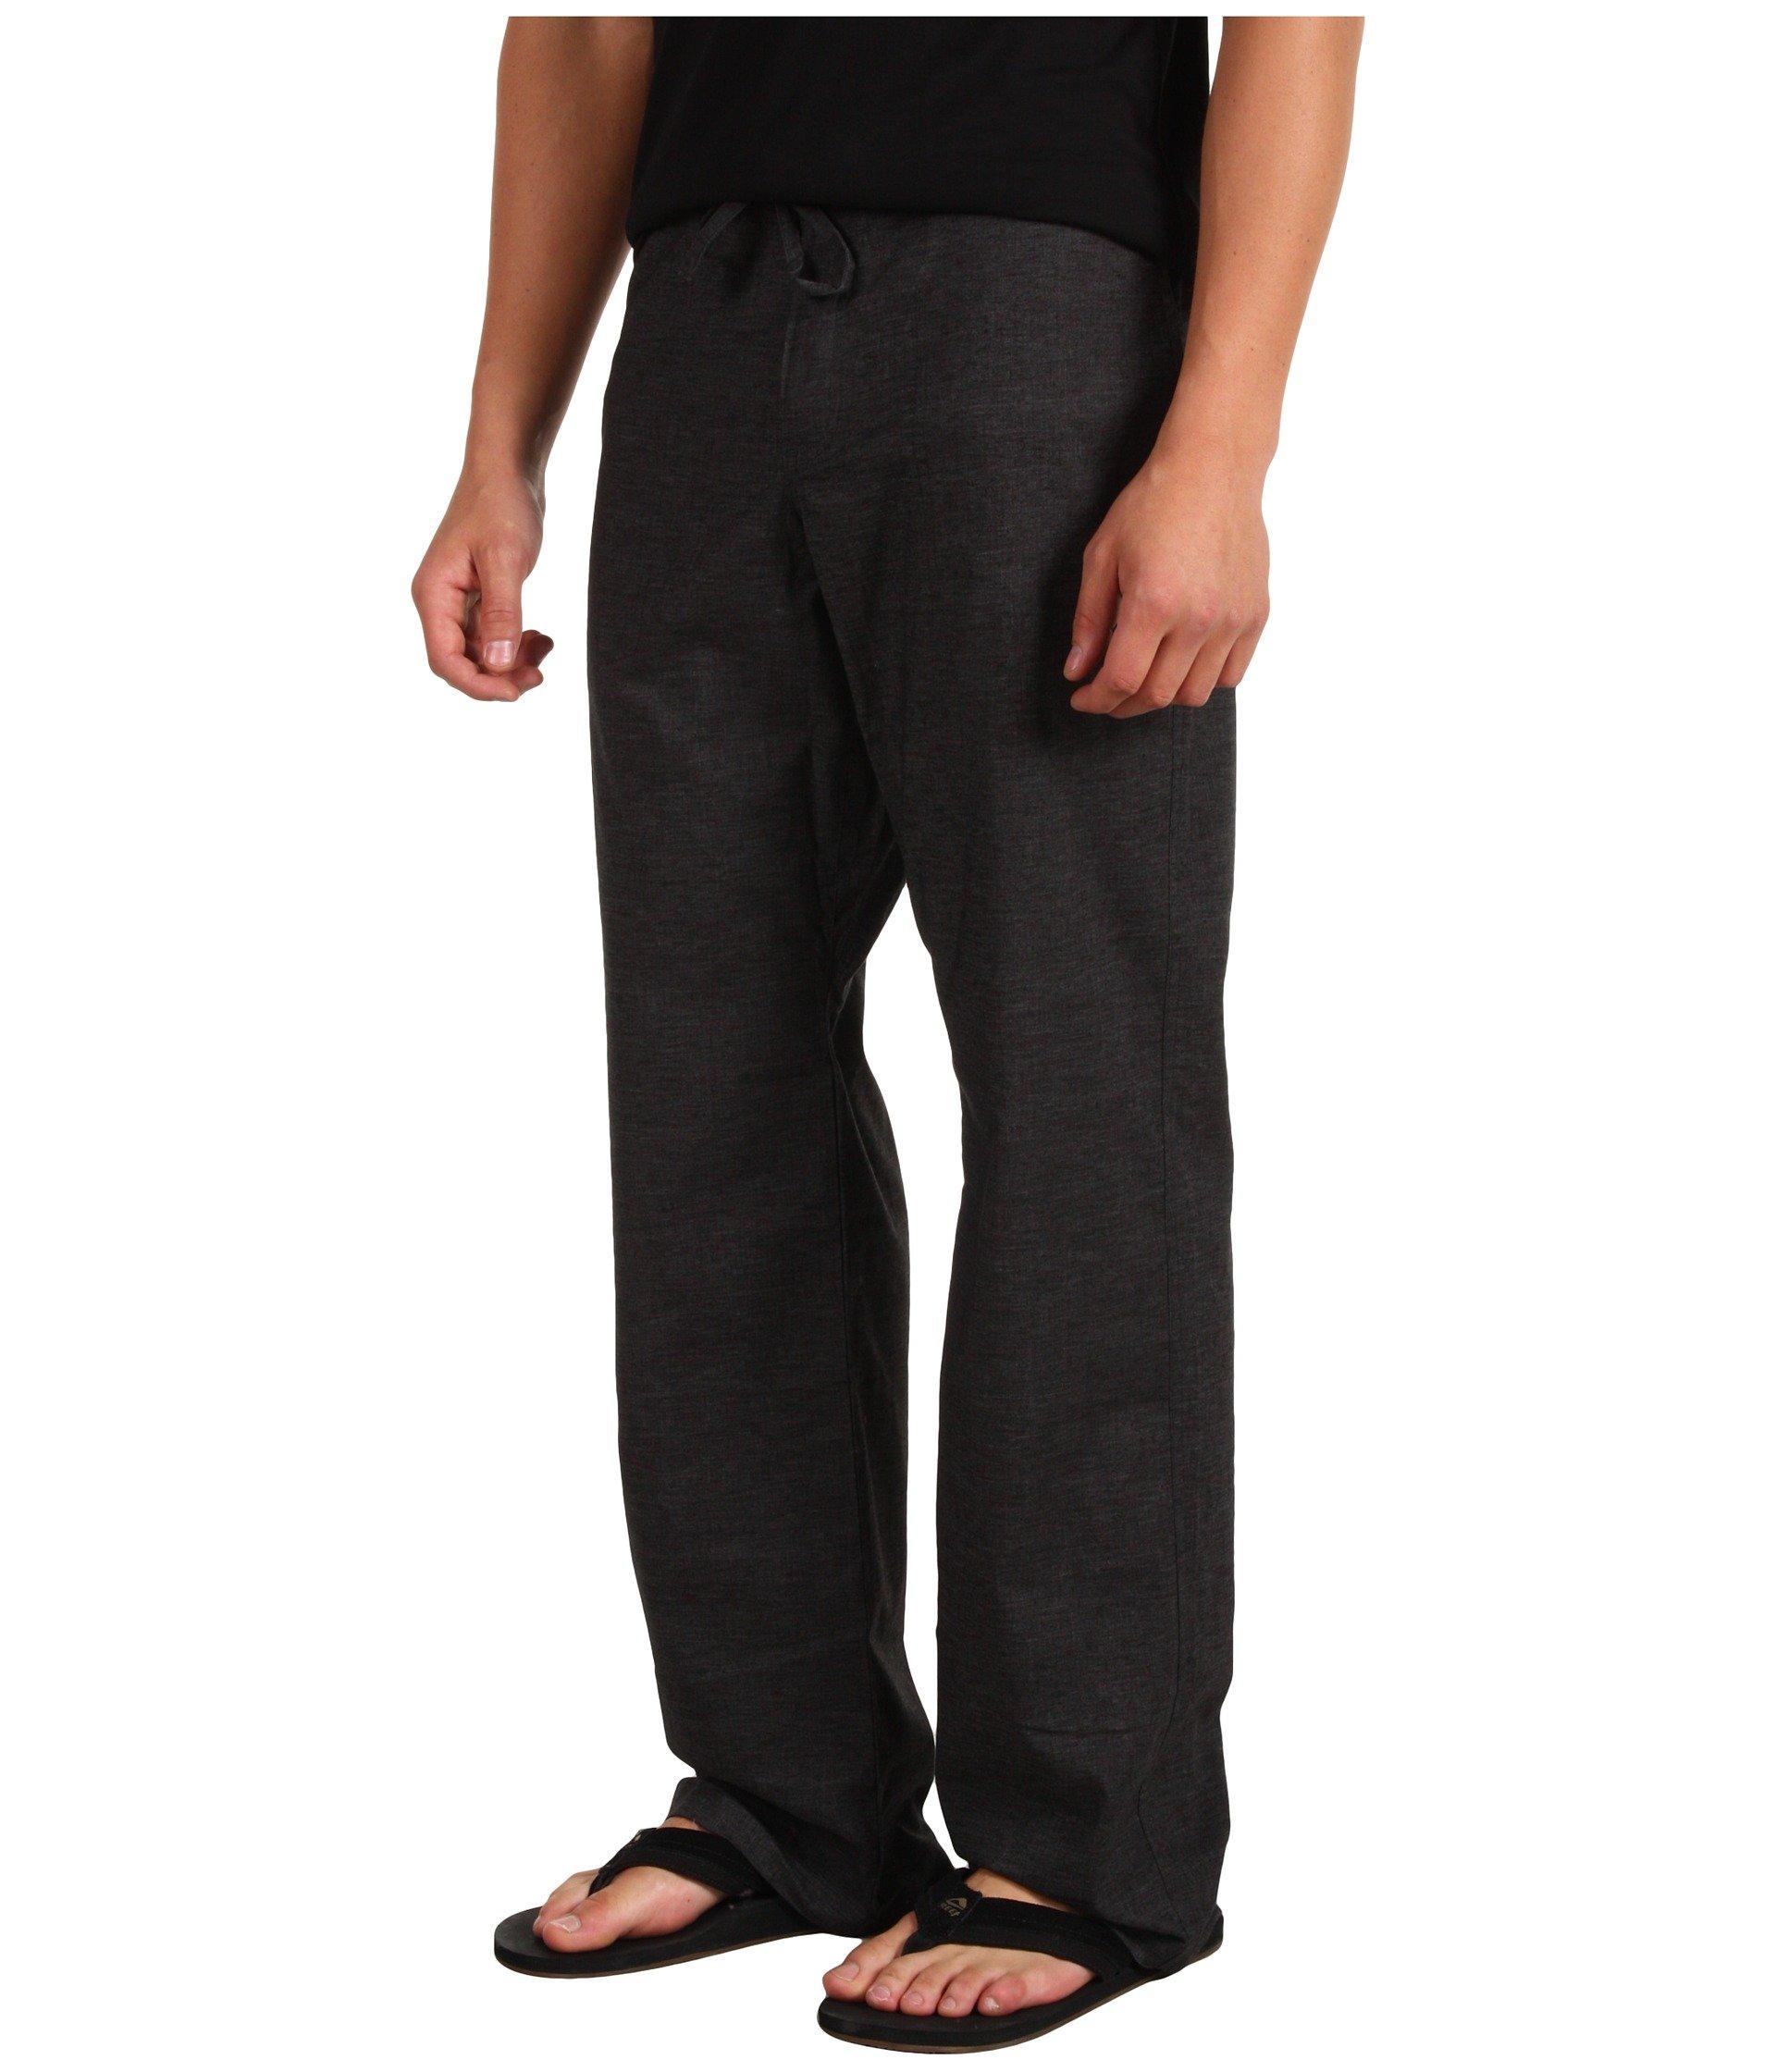 Pant Sutra Black Sutra Black Pant Prana Prana qapTE4p